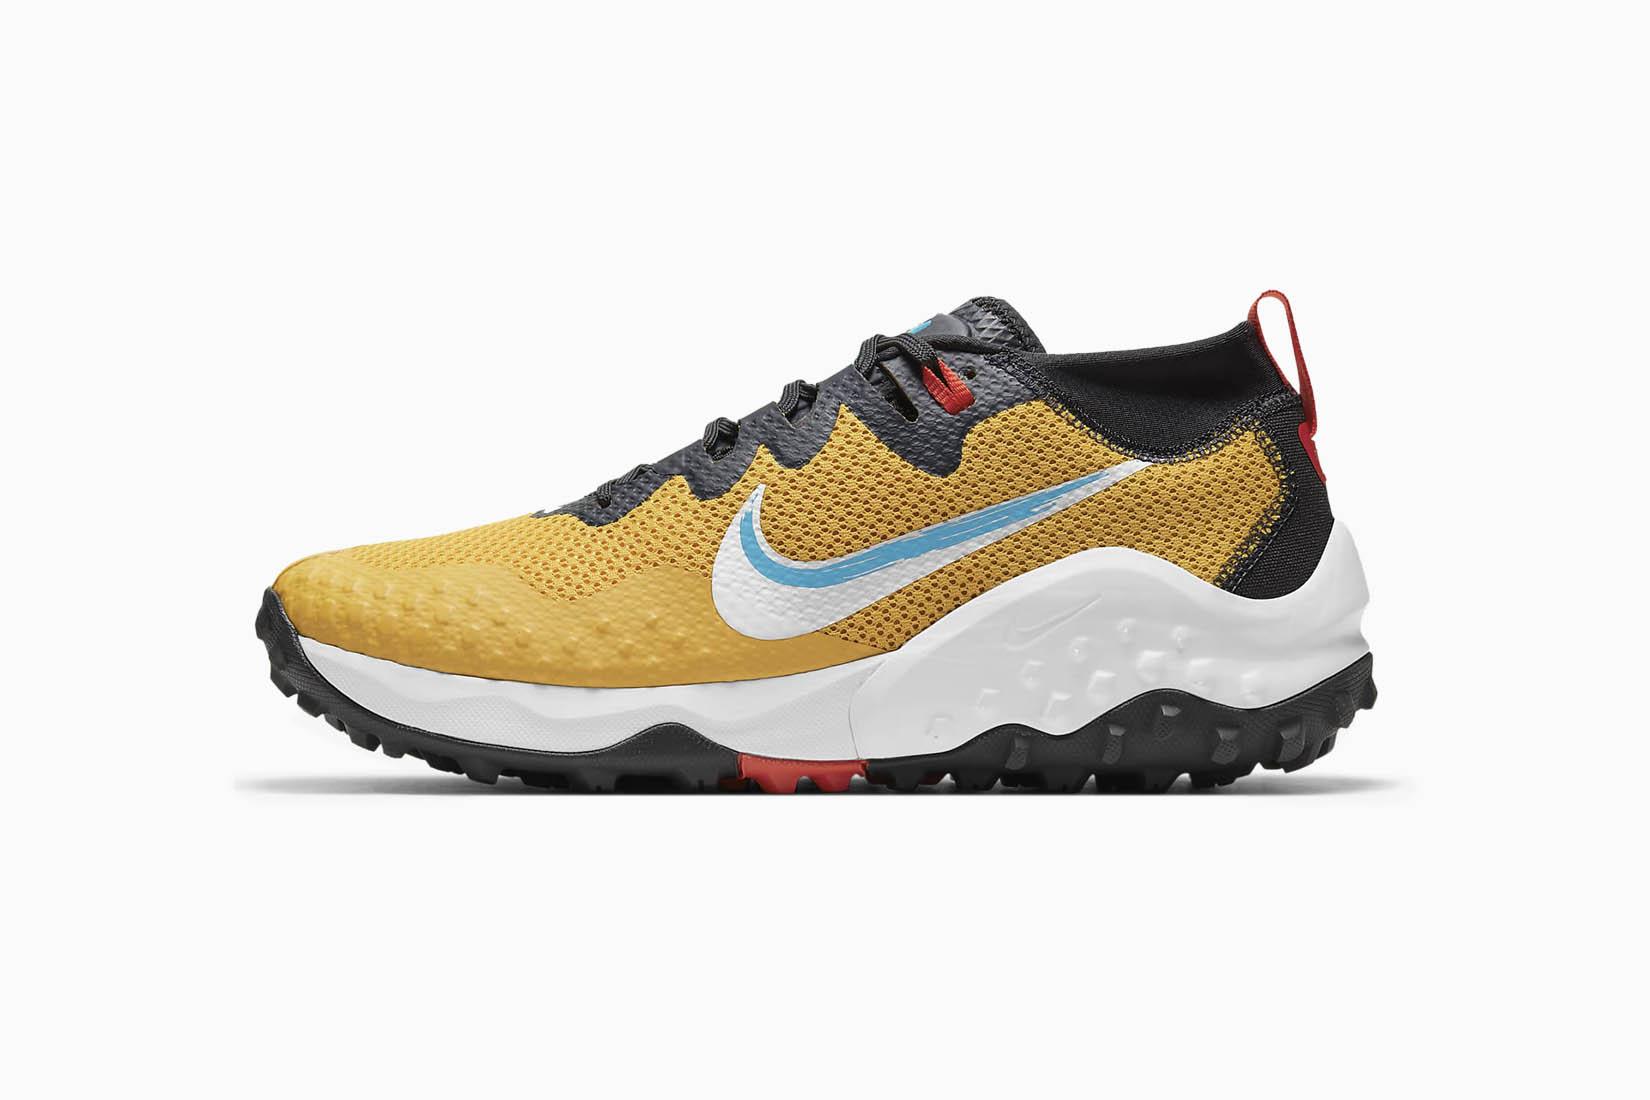 best nike running shoes men nike wildhorse 7 review Luxe Digital